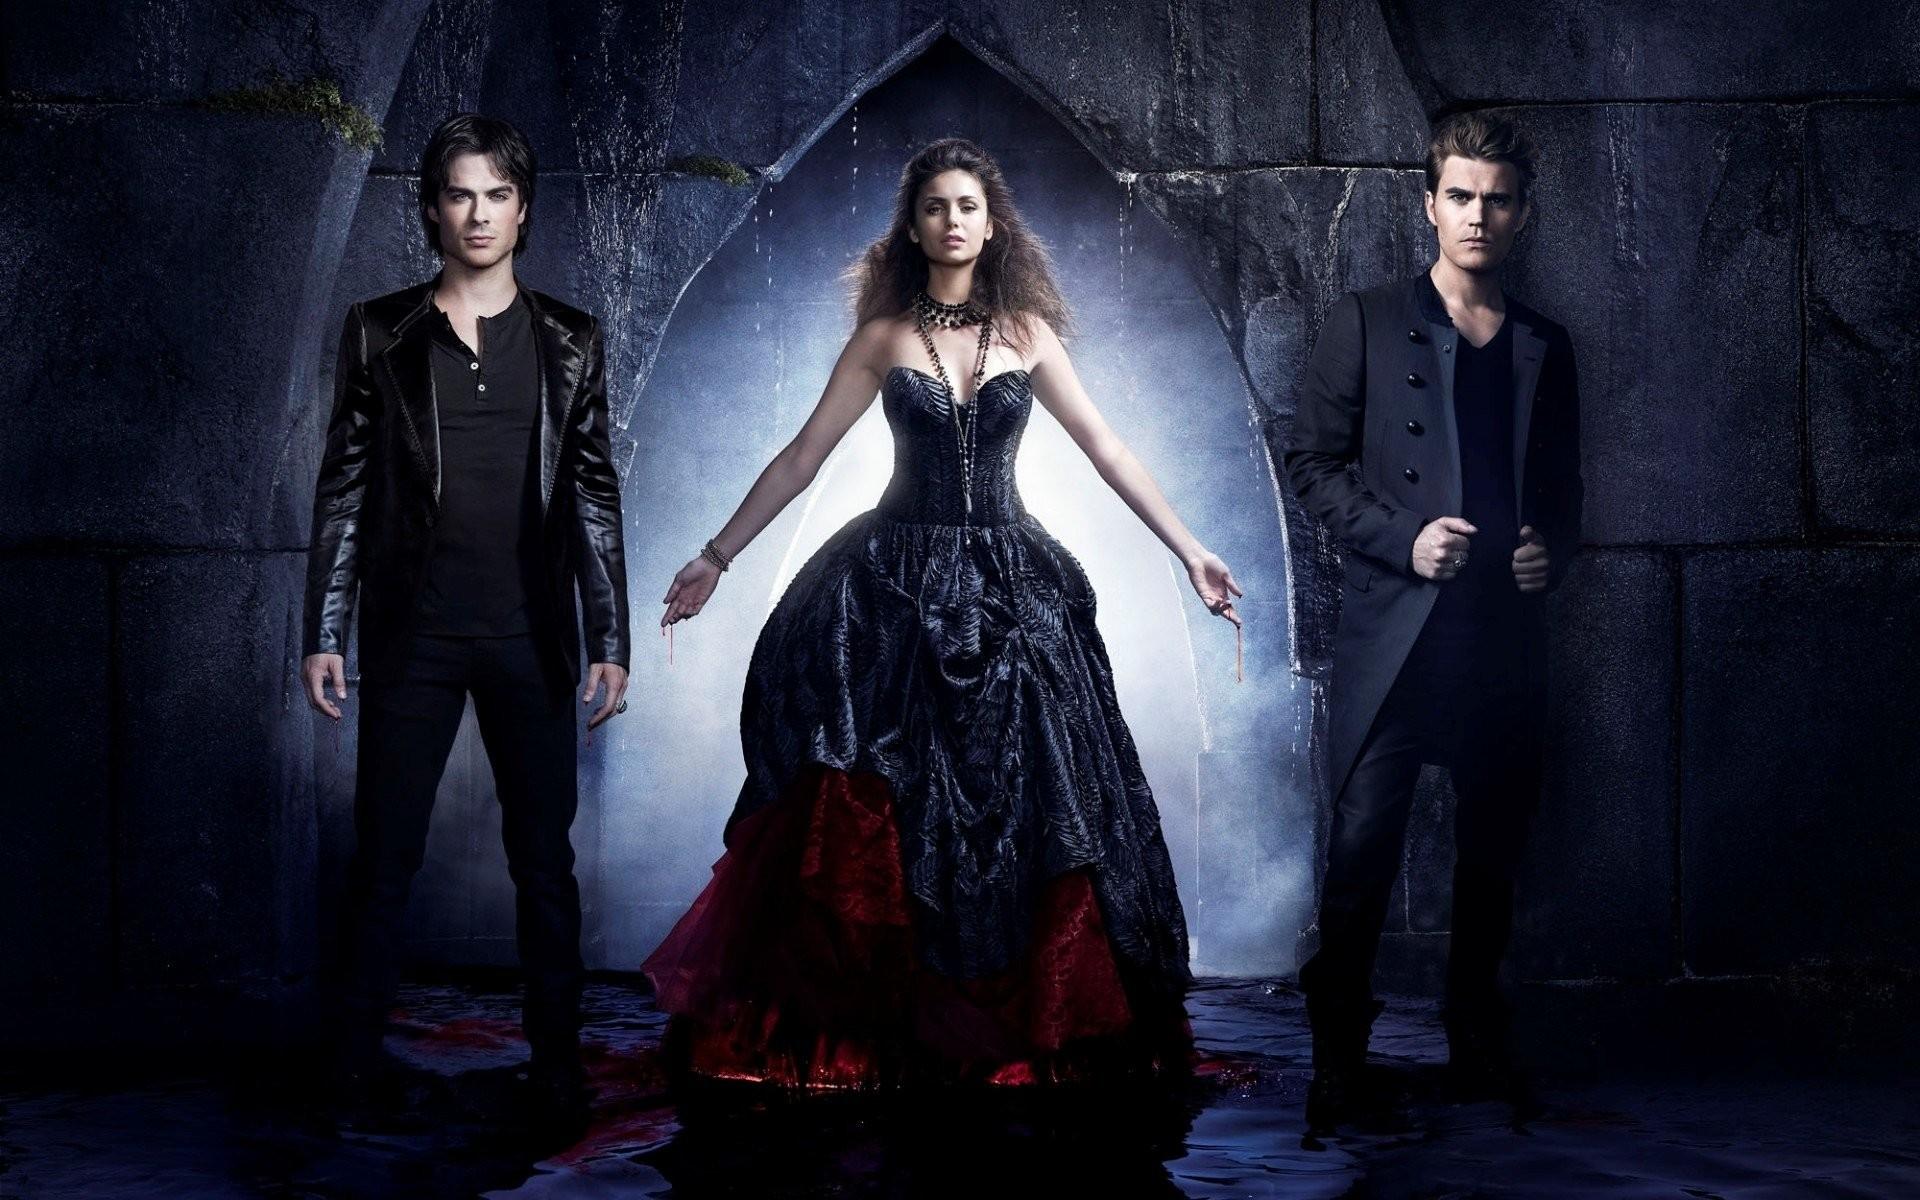 vampire diaries wallpaper damon and elena 74 images